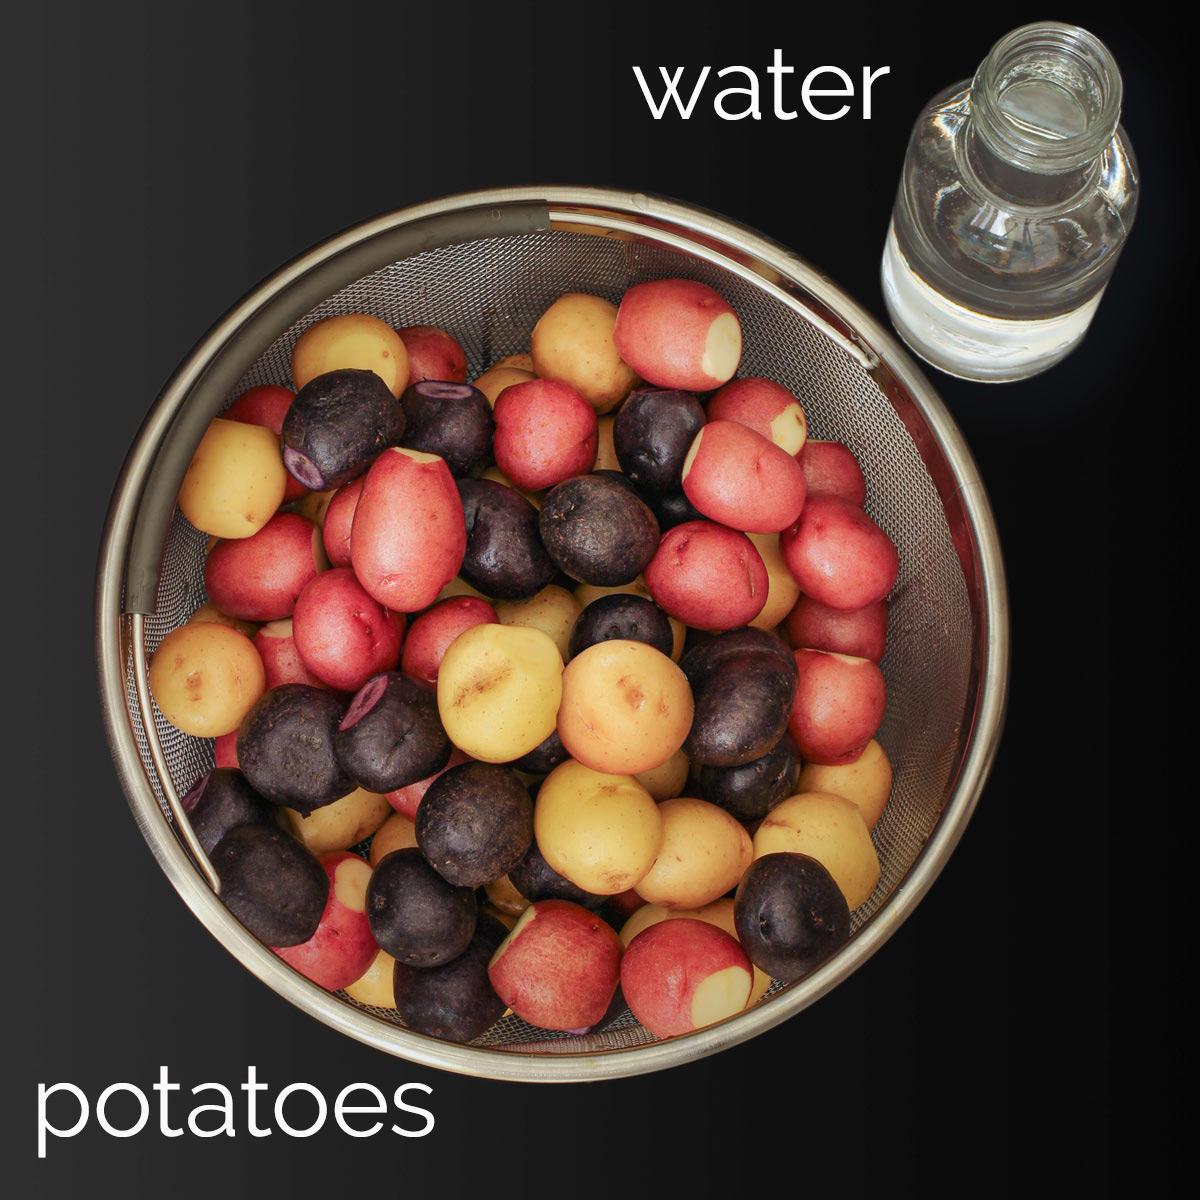 ingredients for instant pot boiled potaotes.